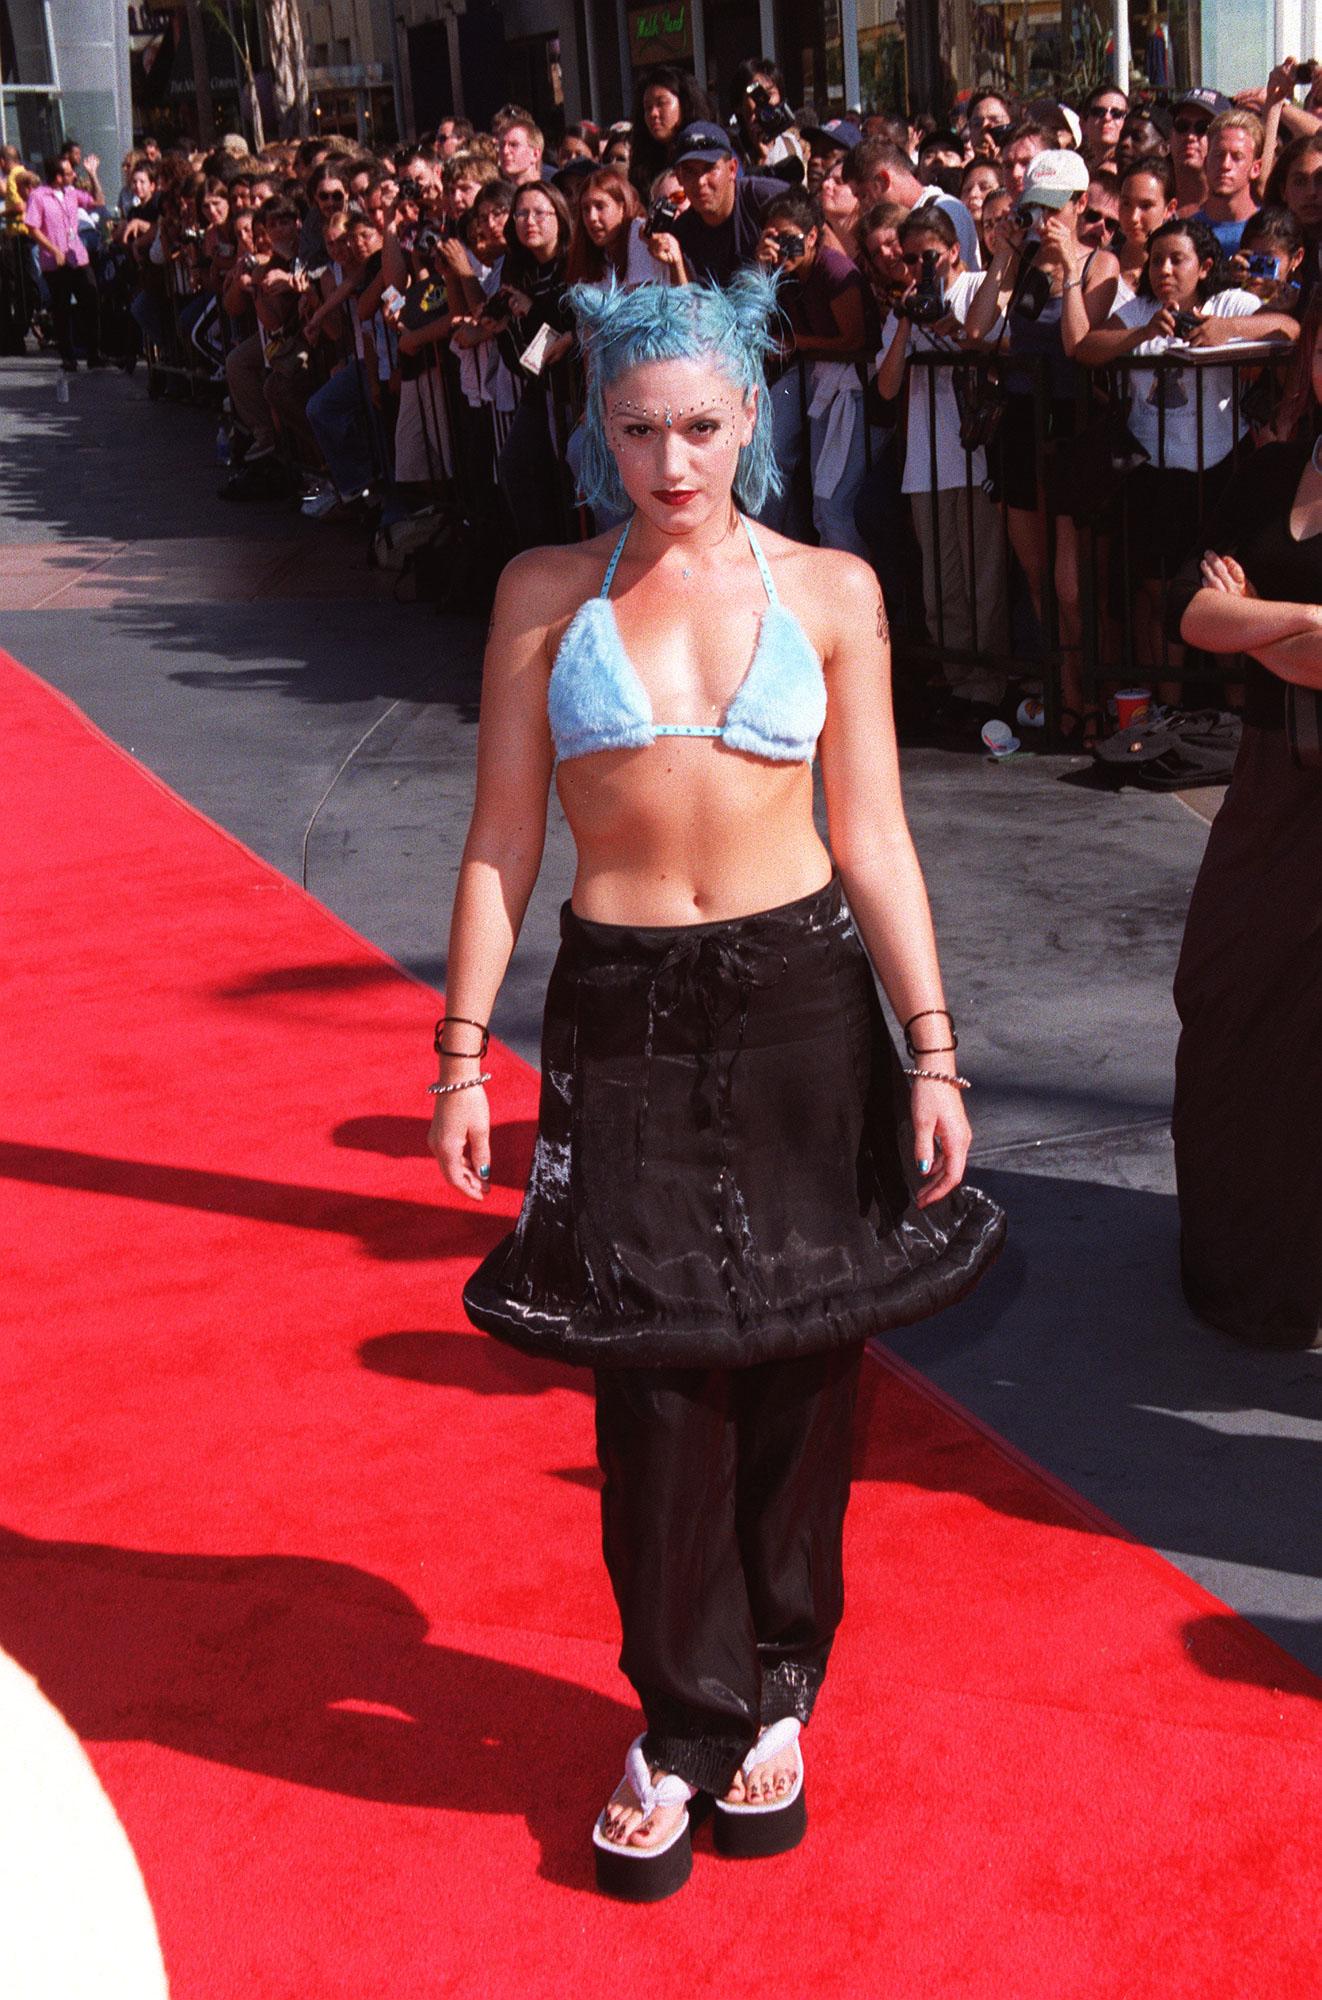 A Brief History of Gwen Stefani's Fashion Brands